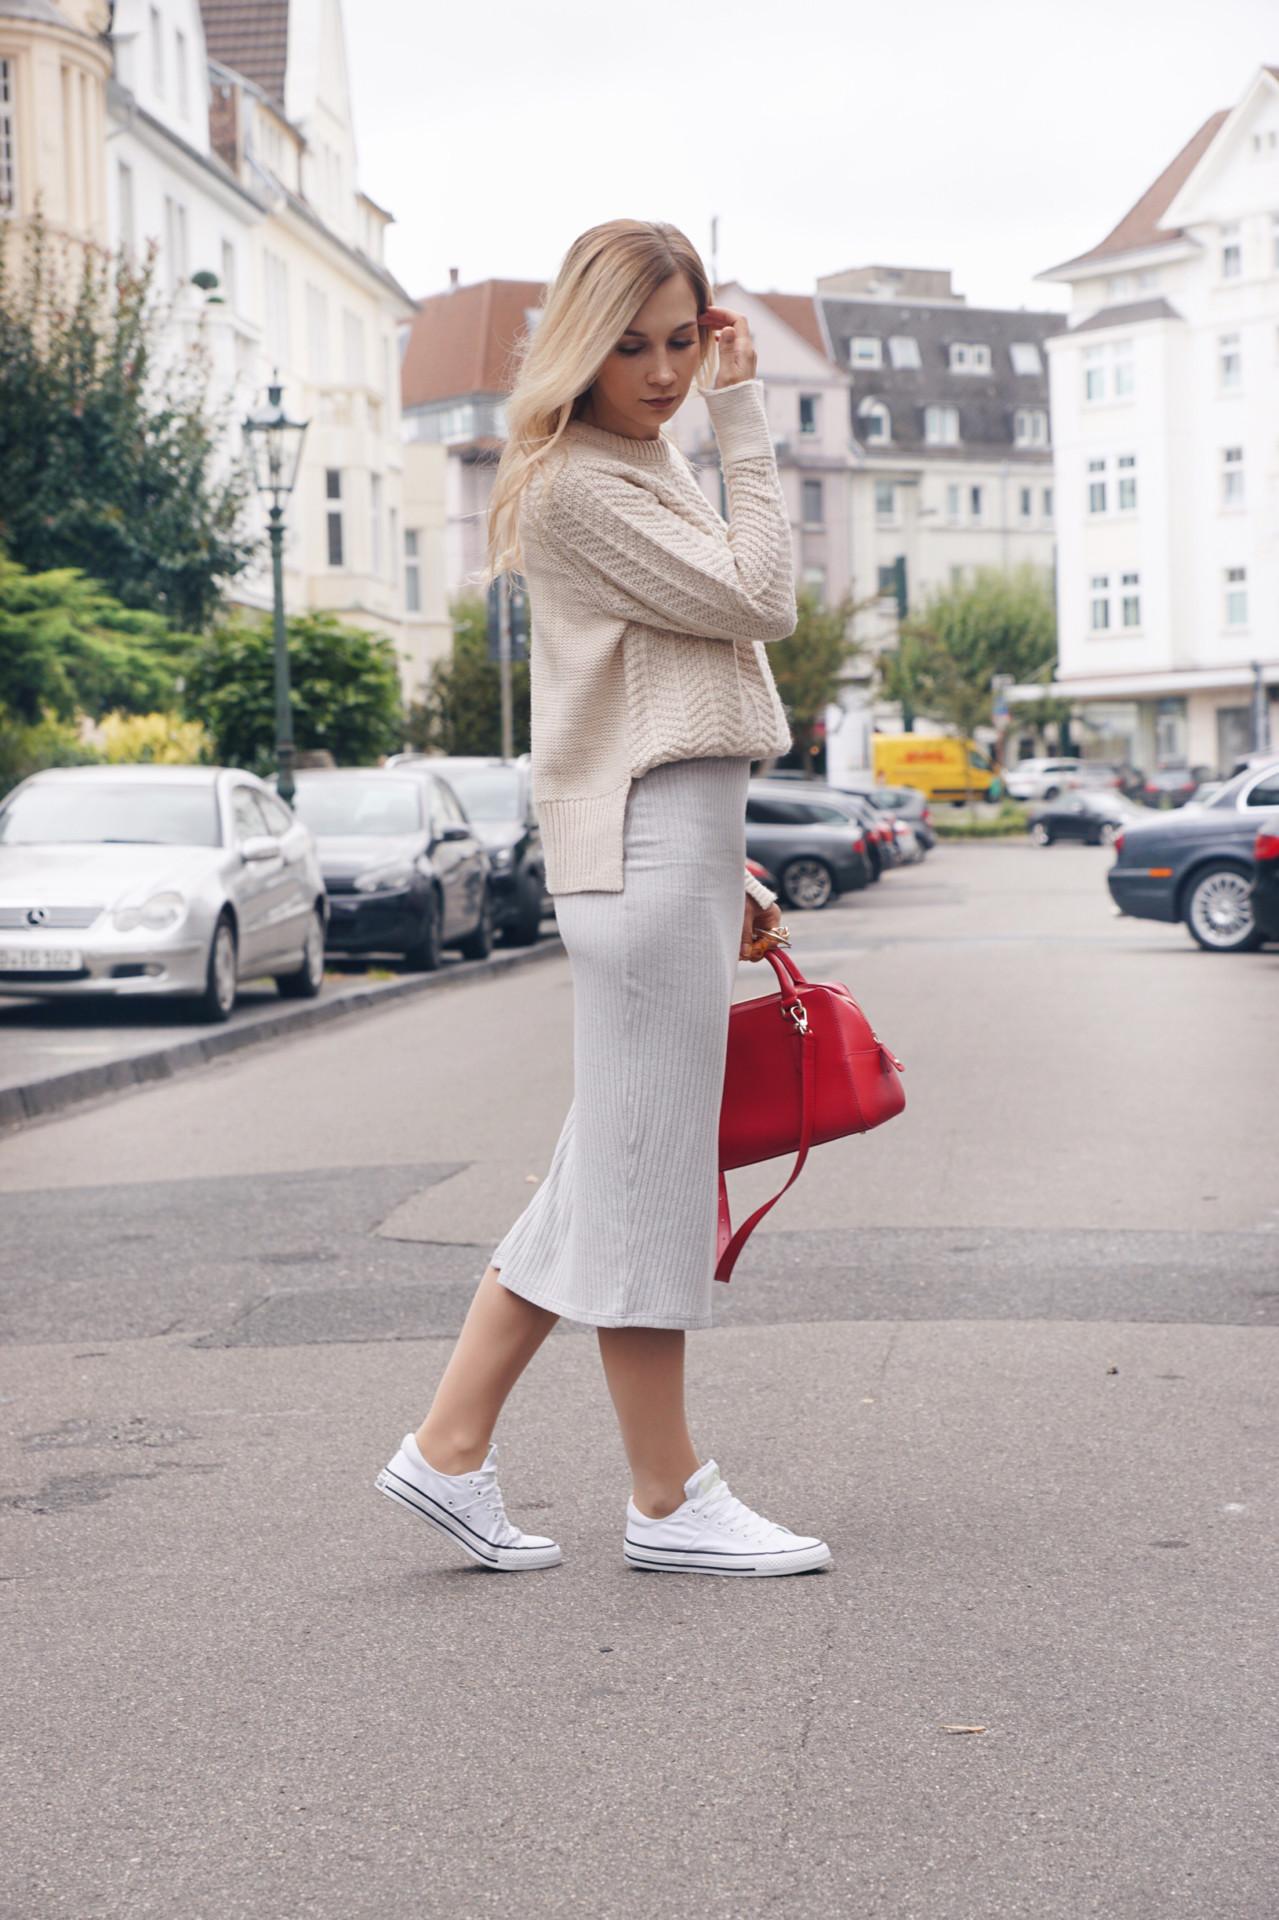 fashionblog_dbkstylez_streetstyle_furla_trends_мода_стиль_тренды